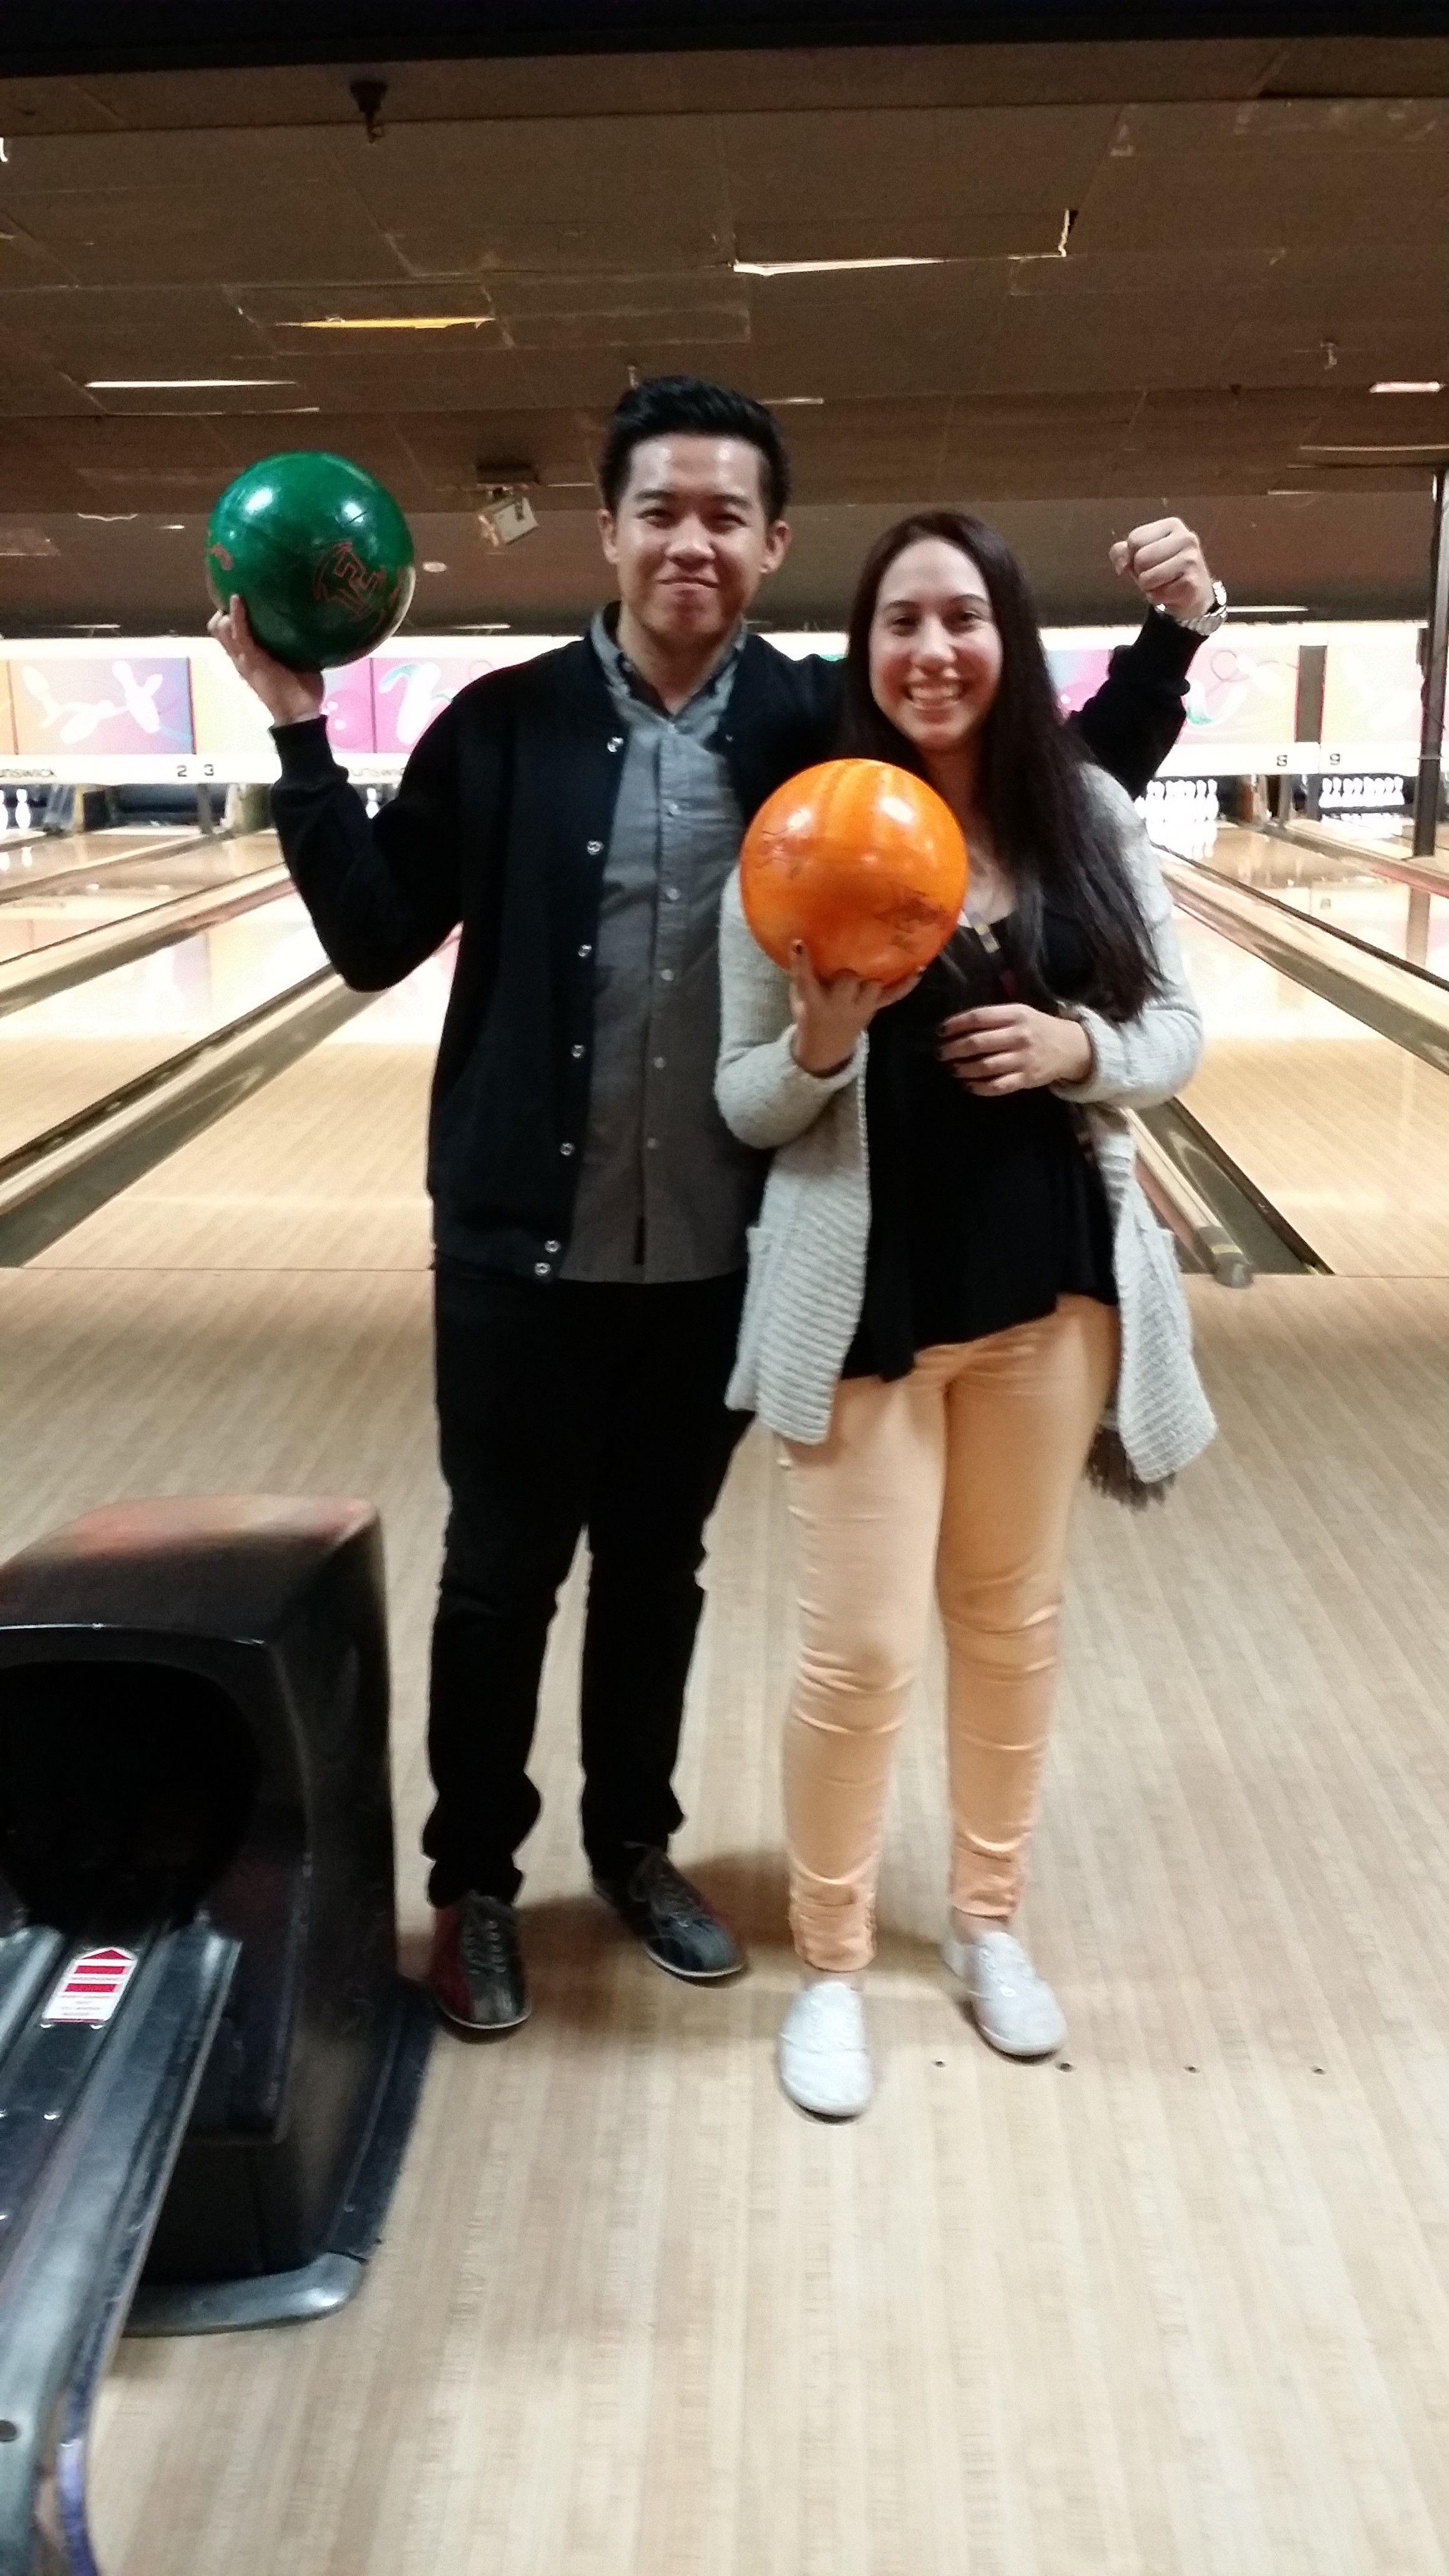 Folsom Lake Bowl 2014 Strikes Lanes Bowling Balls Bowling Shoes Friends Bowling Employee Appreciation Holiday Parties